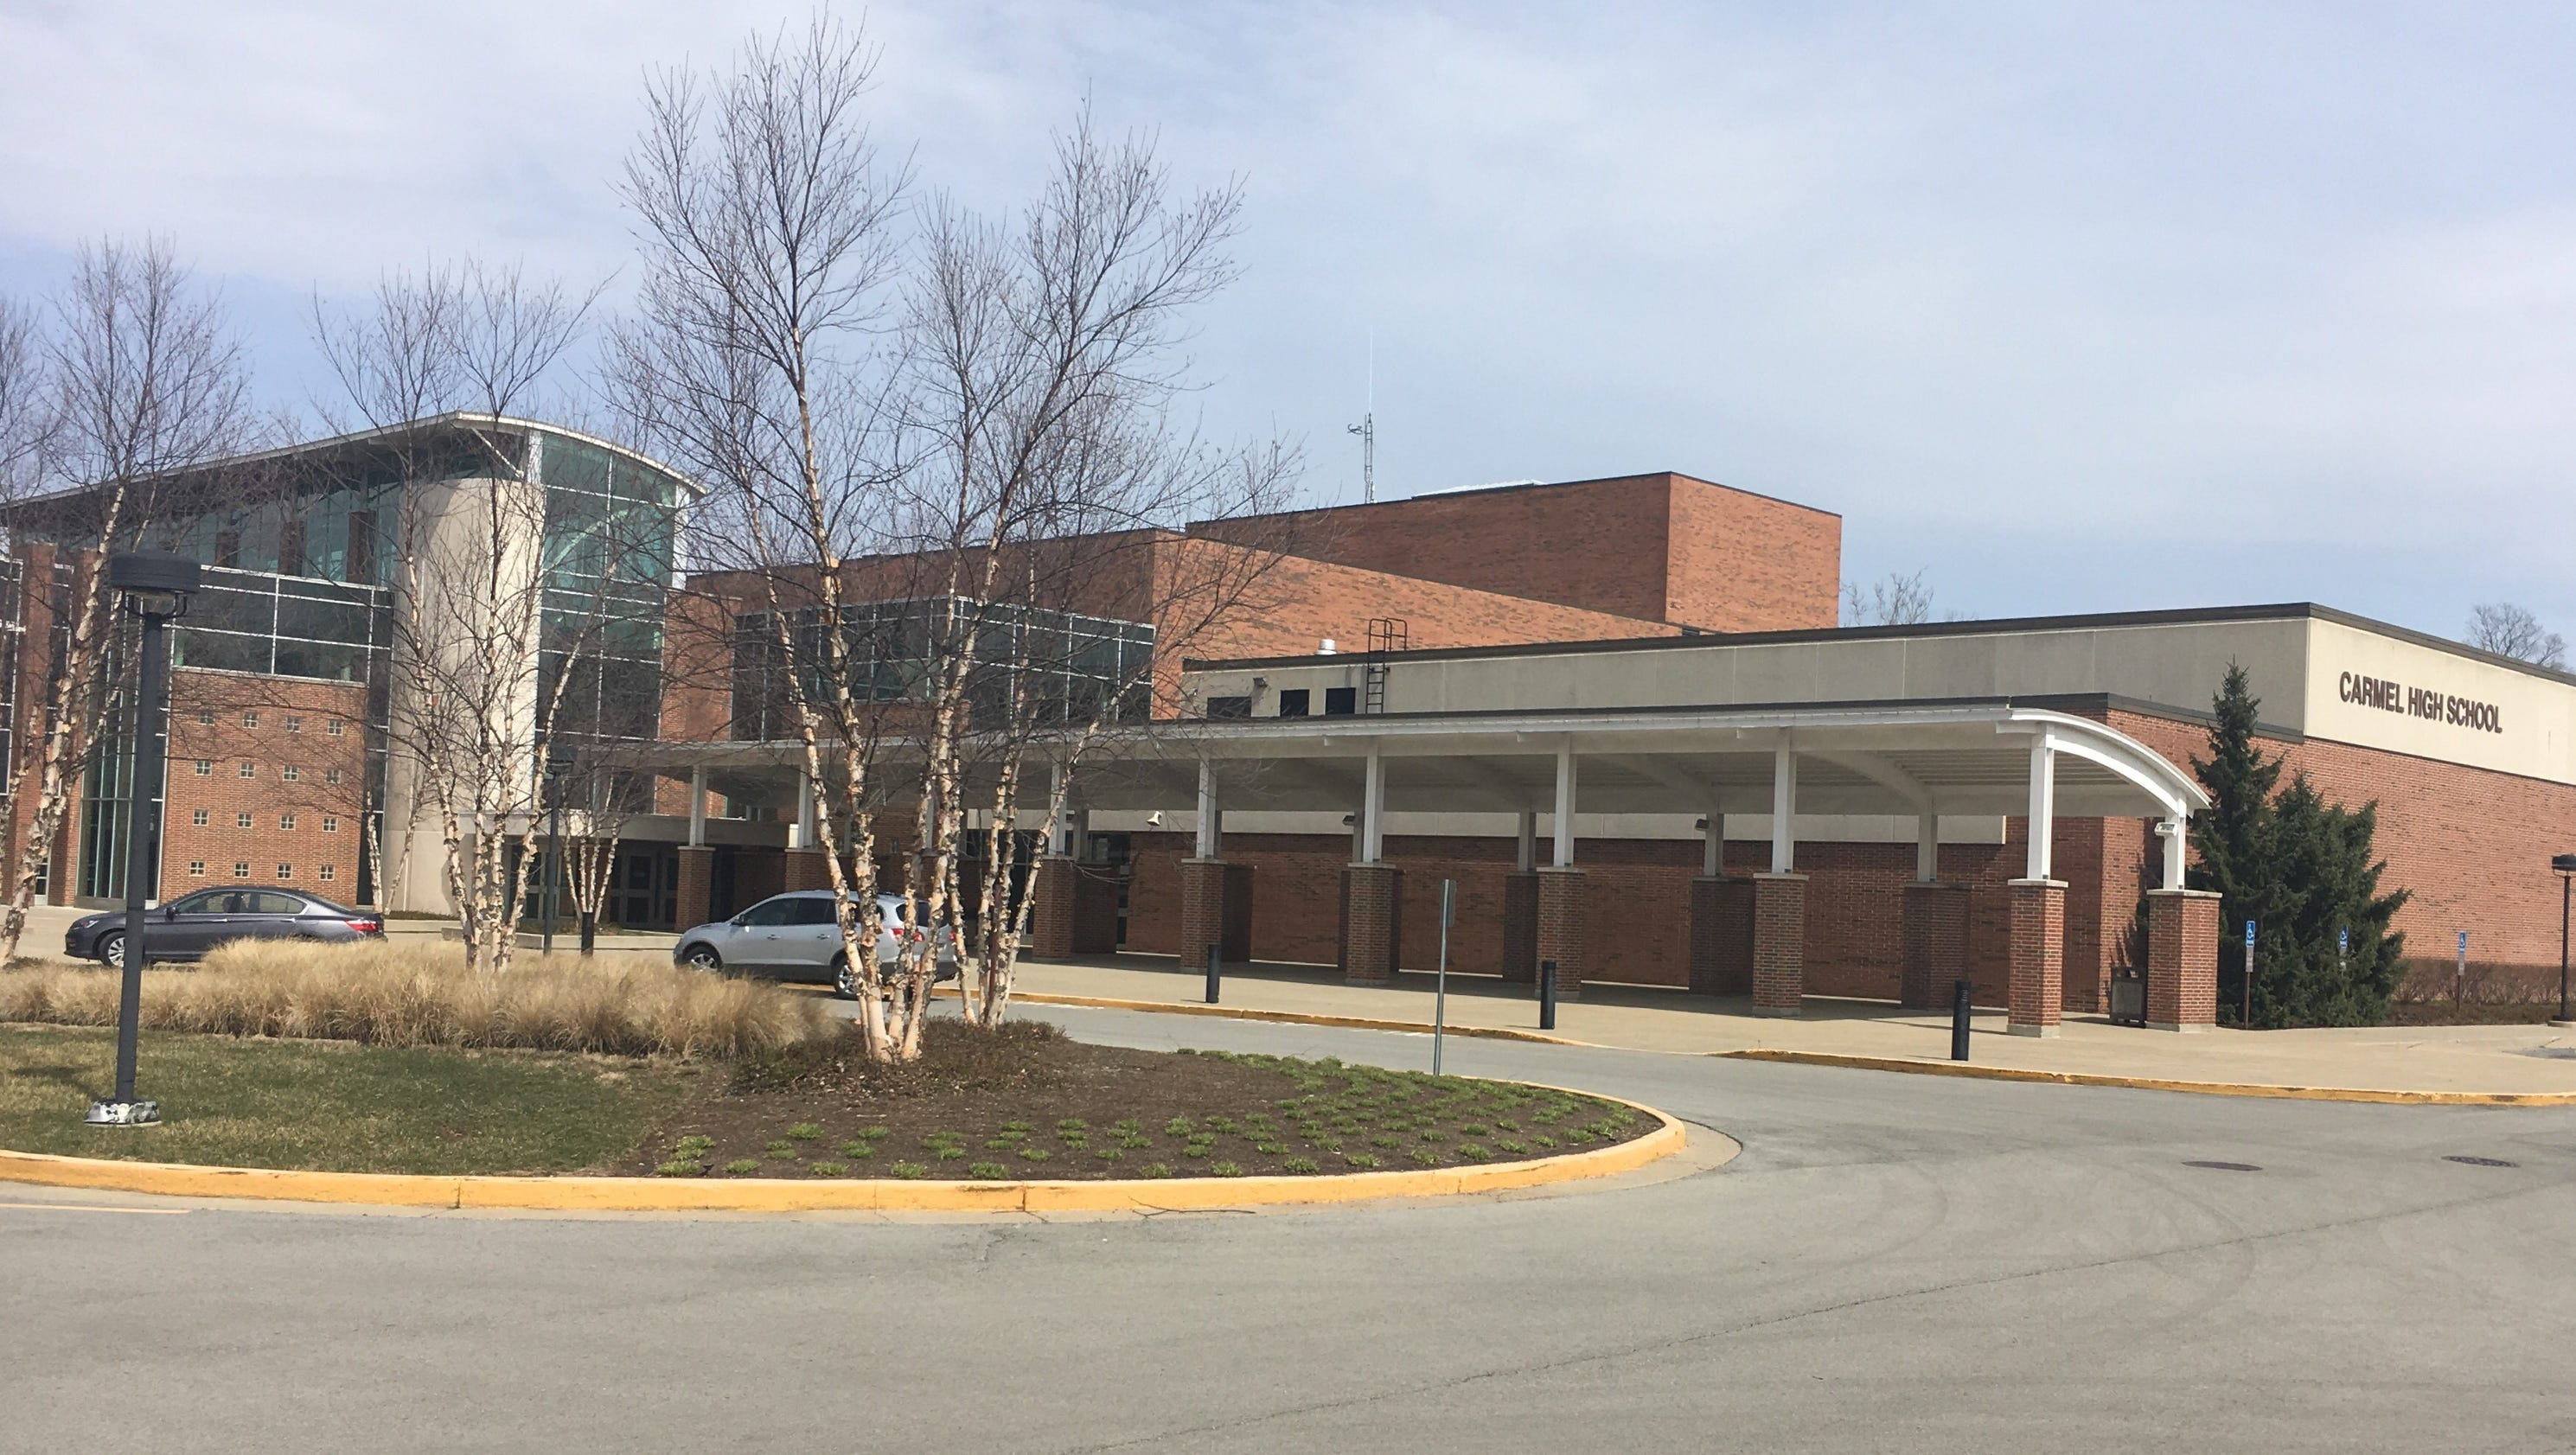 Peek Into The 1 Million Square Foot Carmel High School